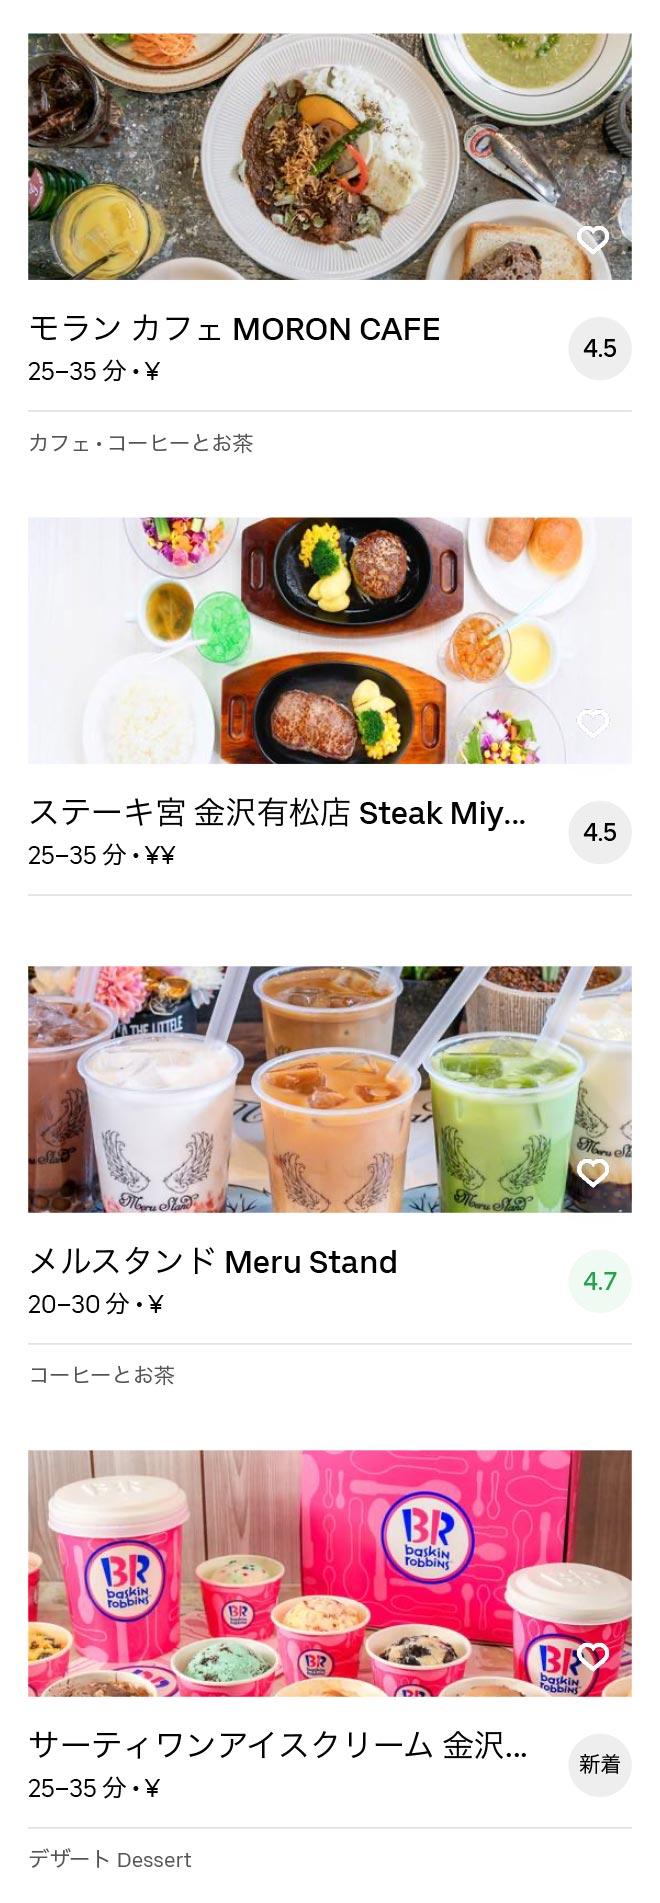 Nishi kanazawa menu 2005 04